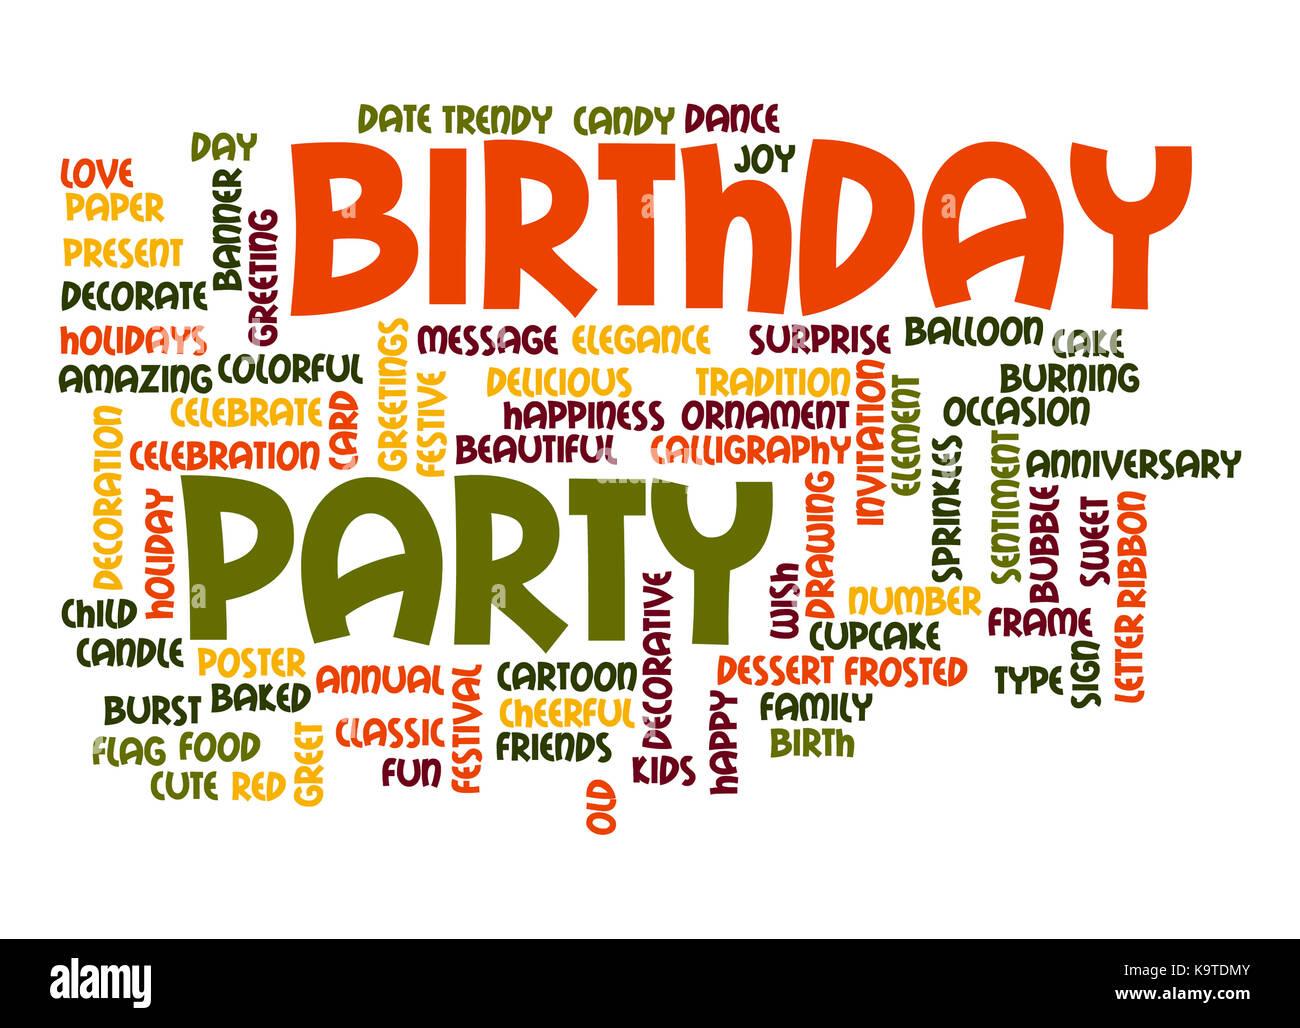 birthday party word cloud stock photo 160962843 alamy